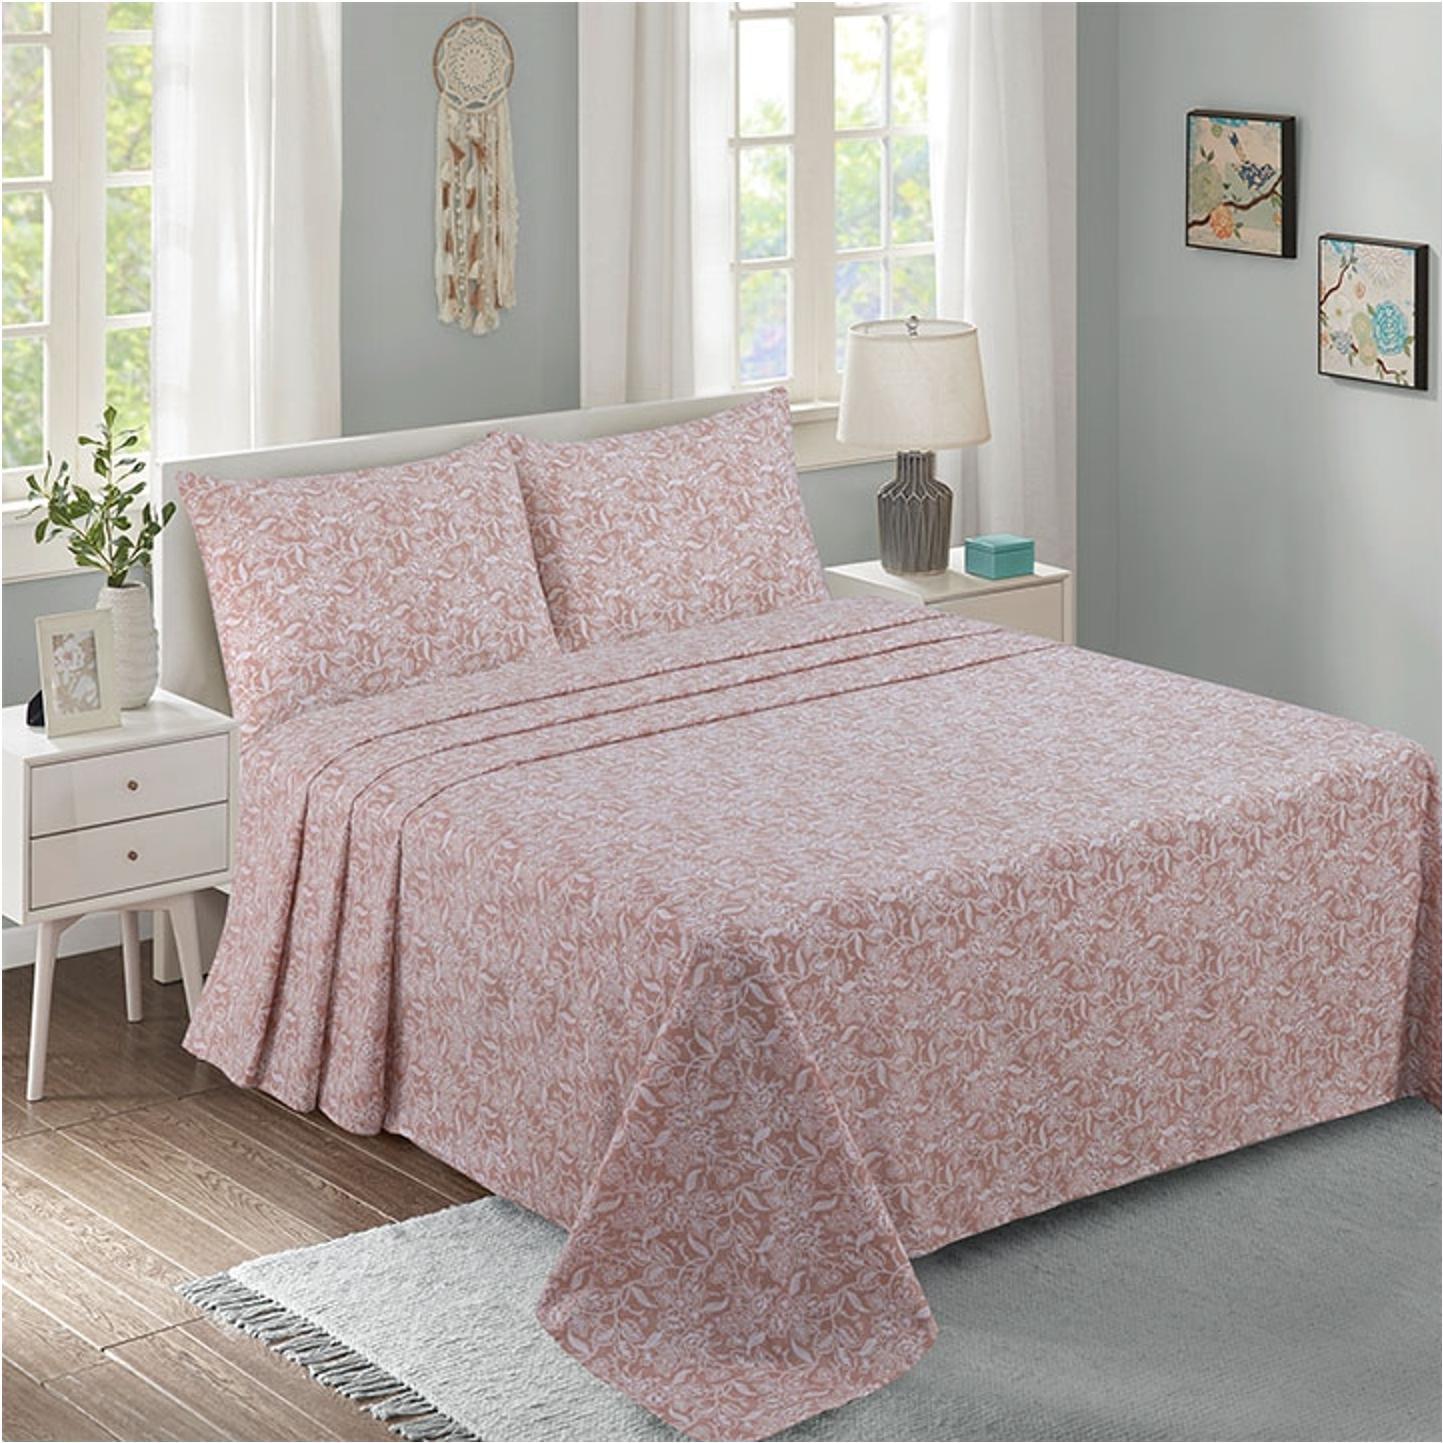 Lino Home Παπλωματοθηκη Μονή 160×240 Gela Pink